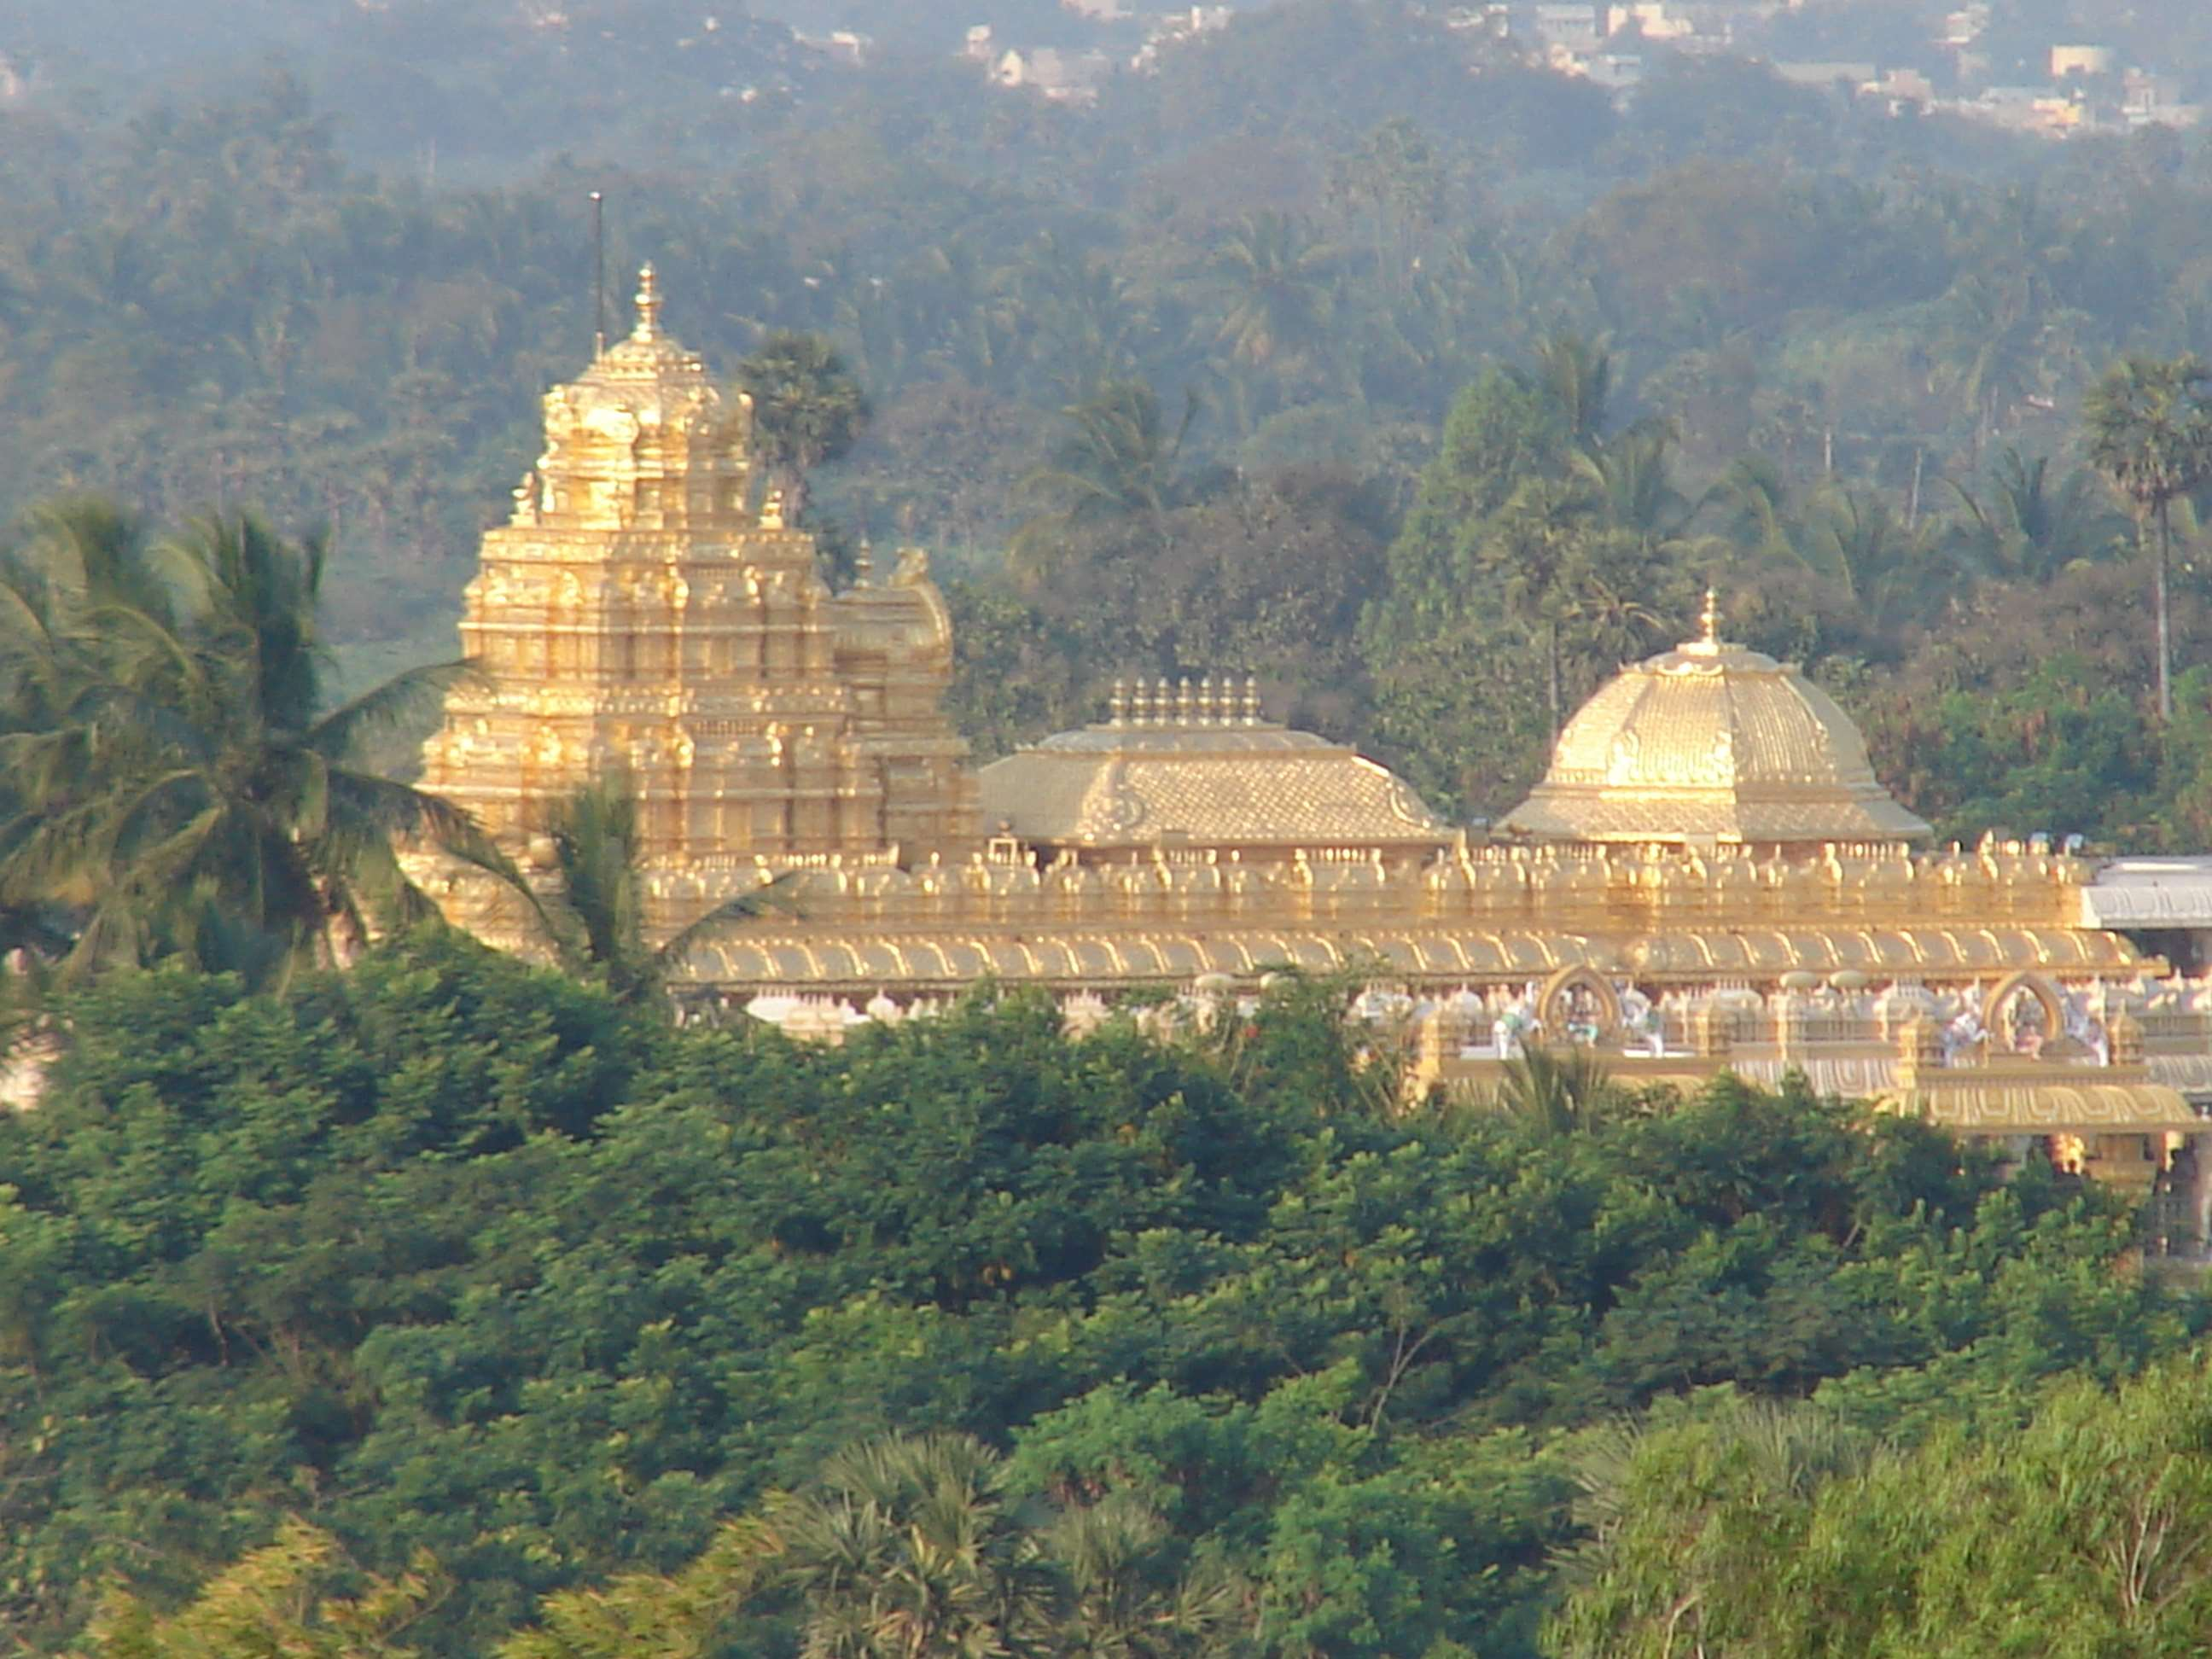 gold-temple-vellore-india-secret-world